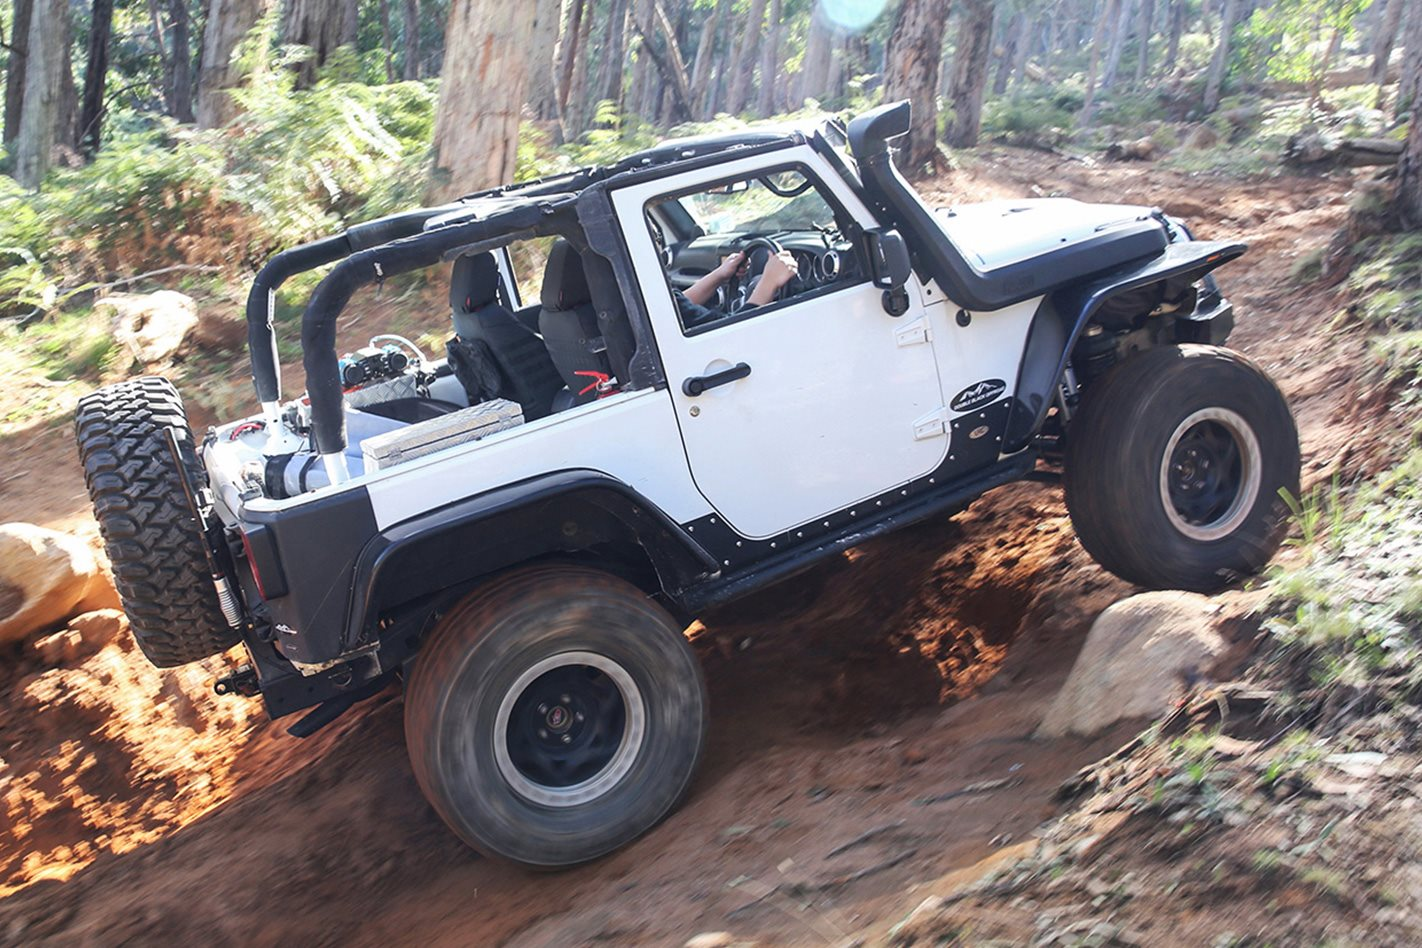 2013-Jeep-Wrangler-Rubicon-Double-Black-offroad-exterior.jpg